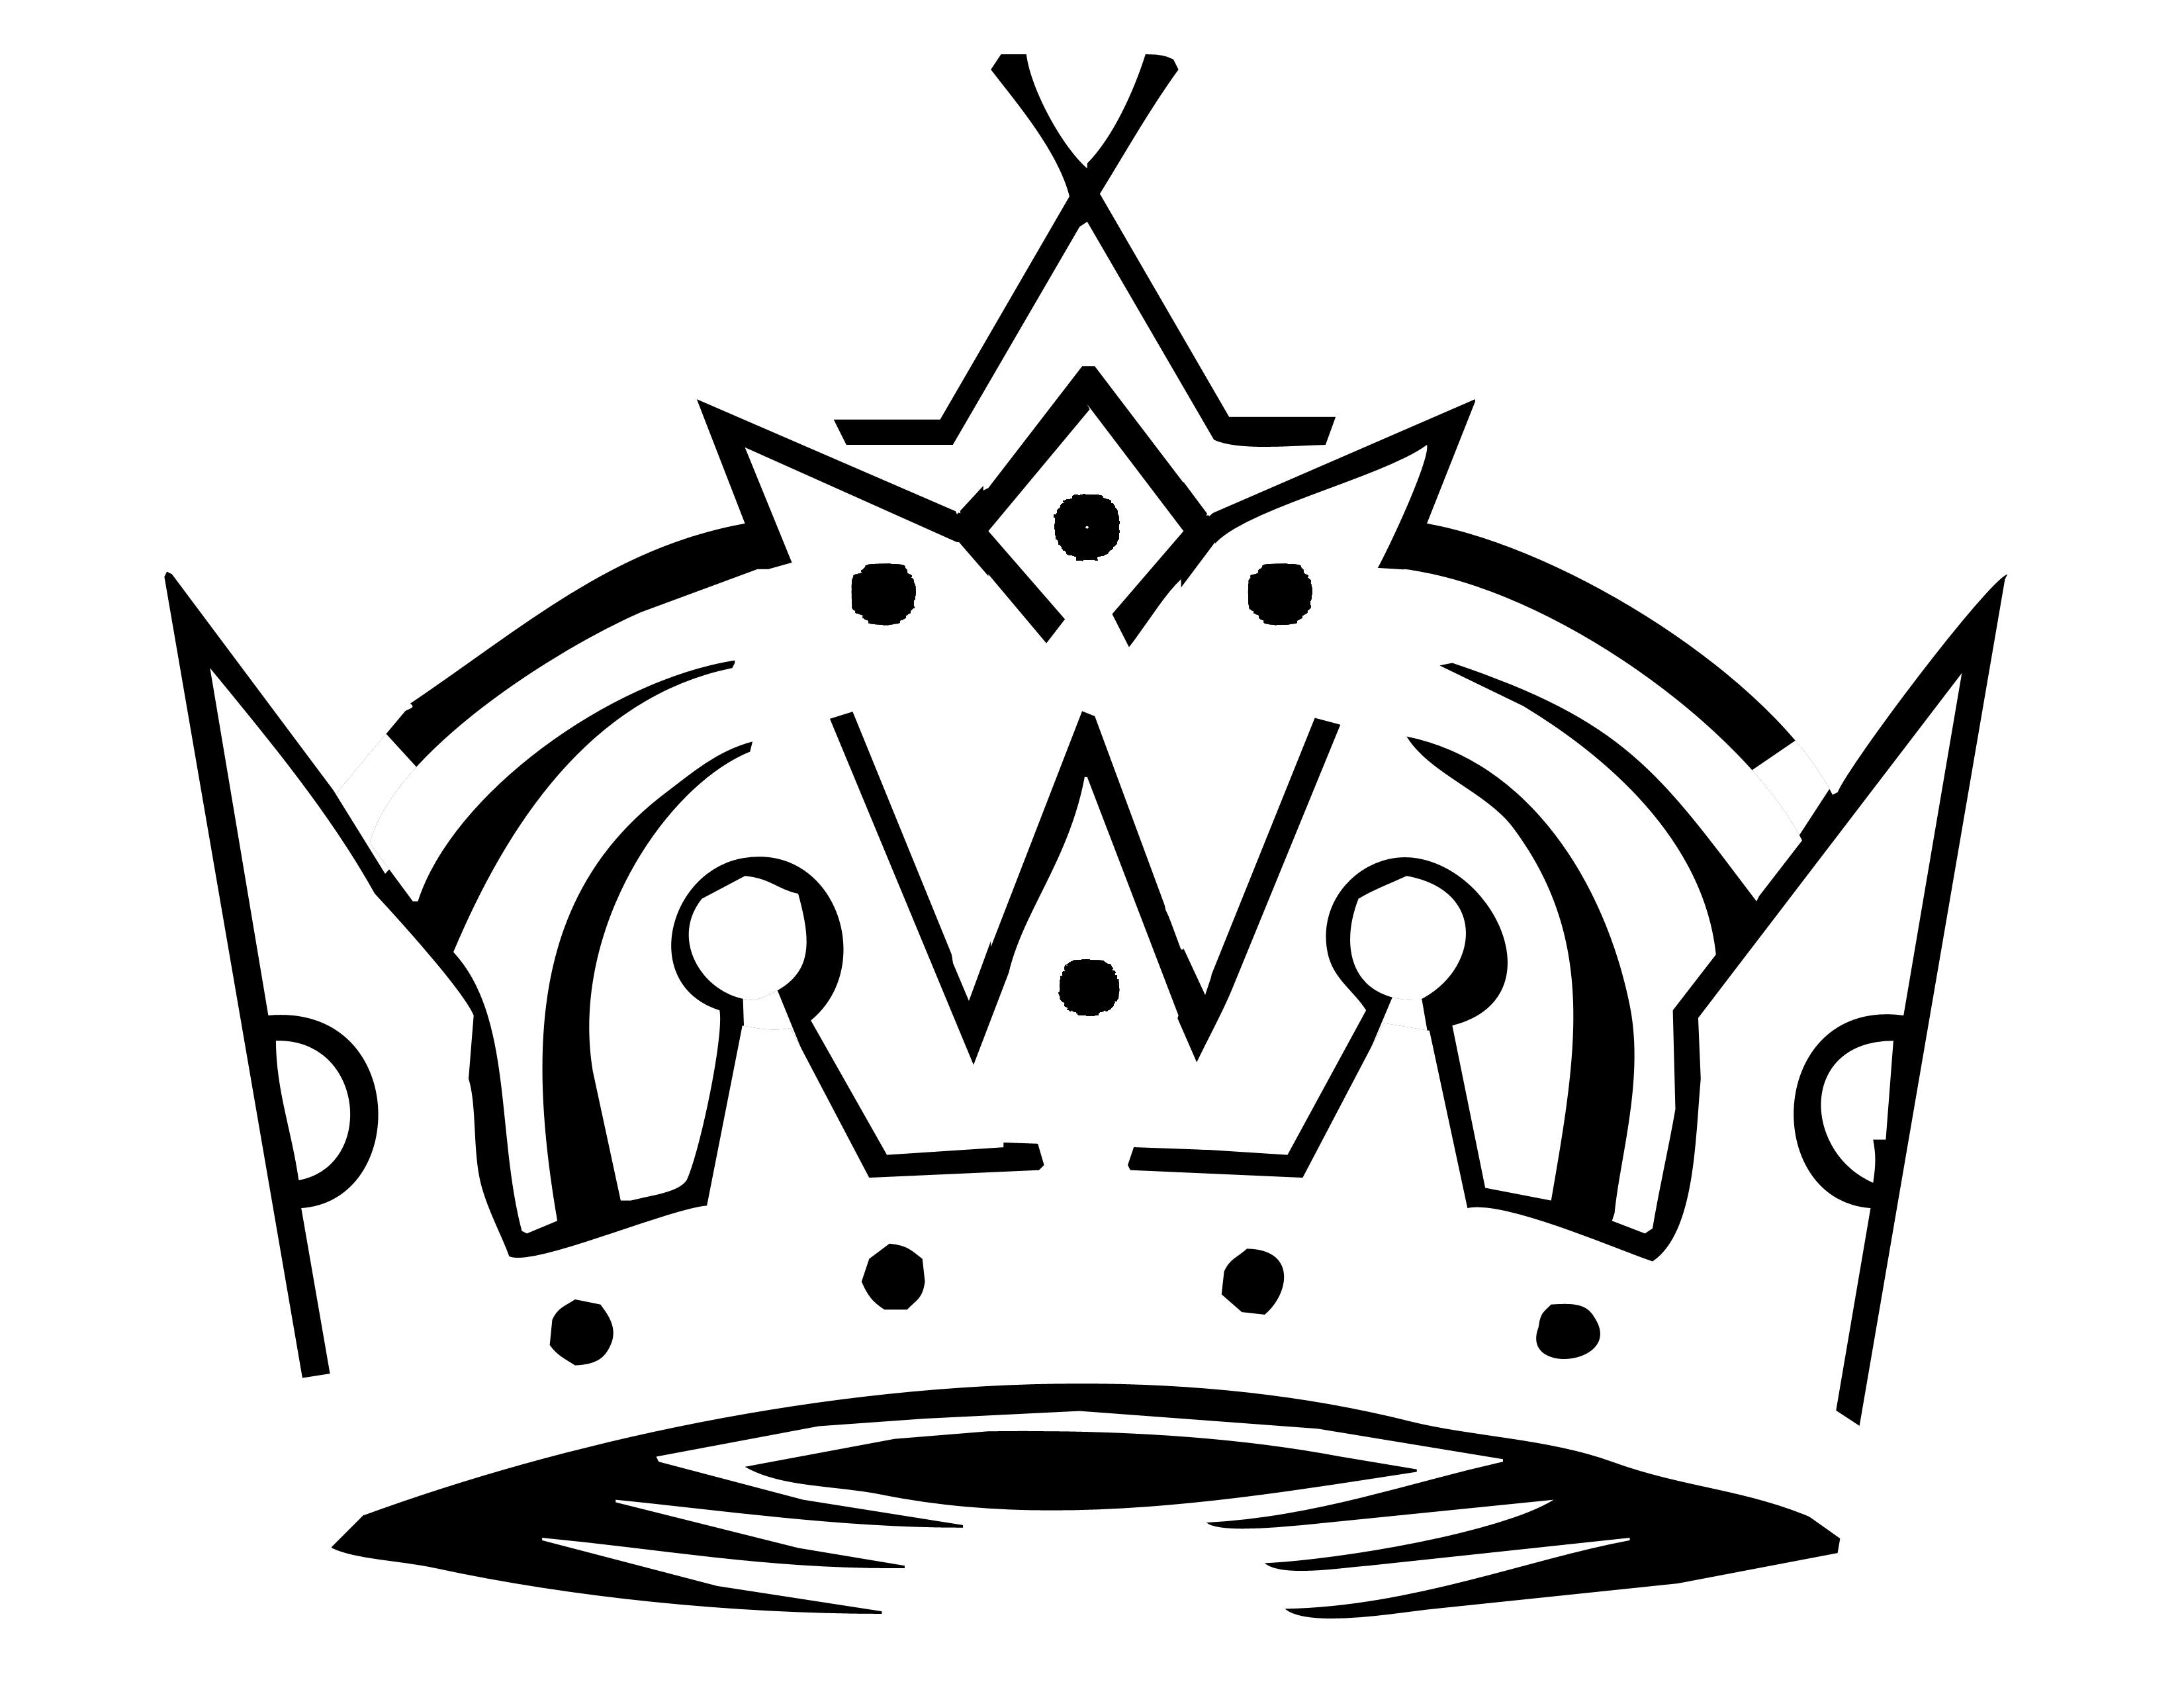 3300x2550 Graffiti Crown Drawings How To Draw A Graffiti Crown